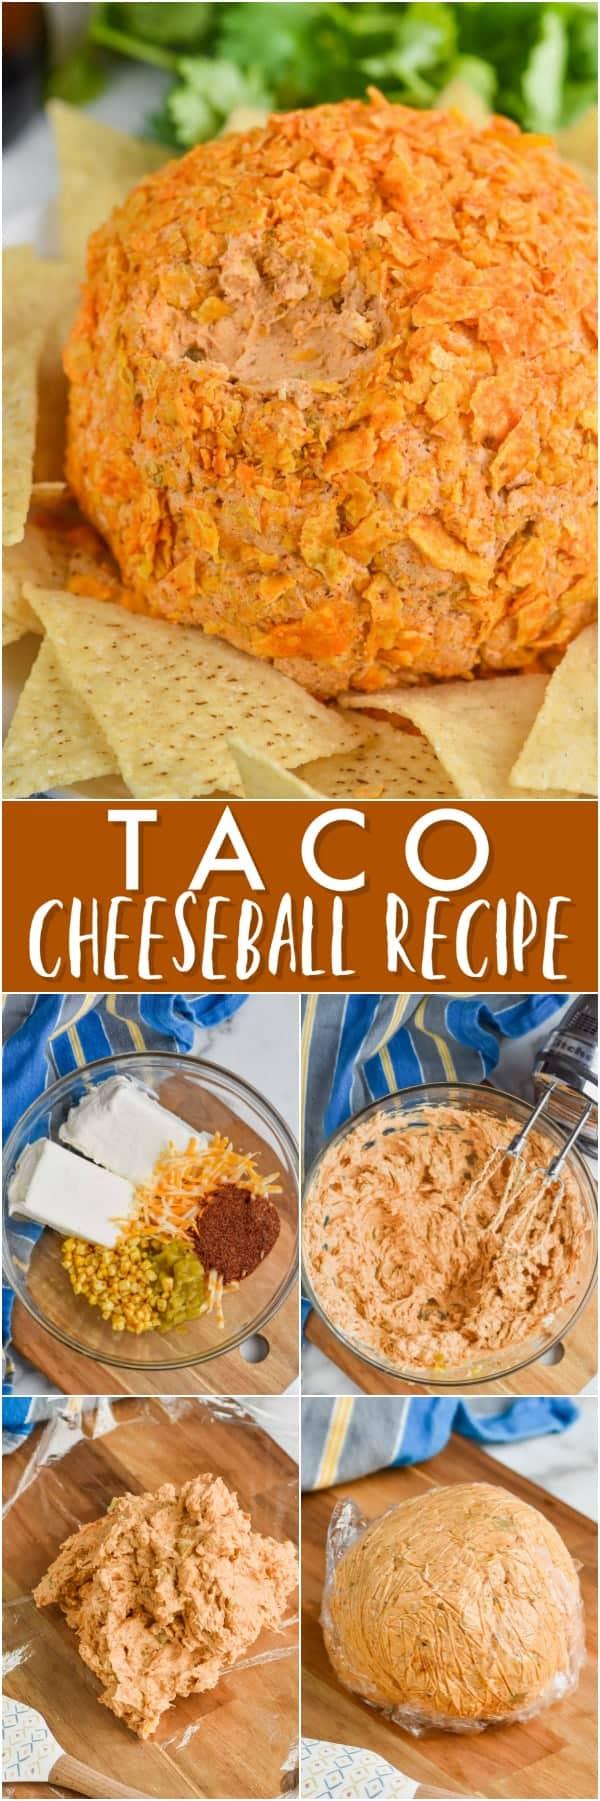 close up of taco cheese ball recipe covered in broken up doritos